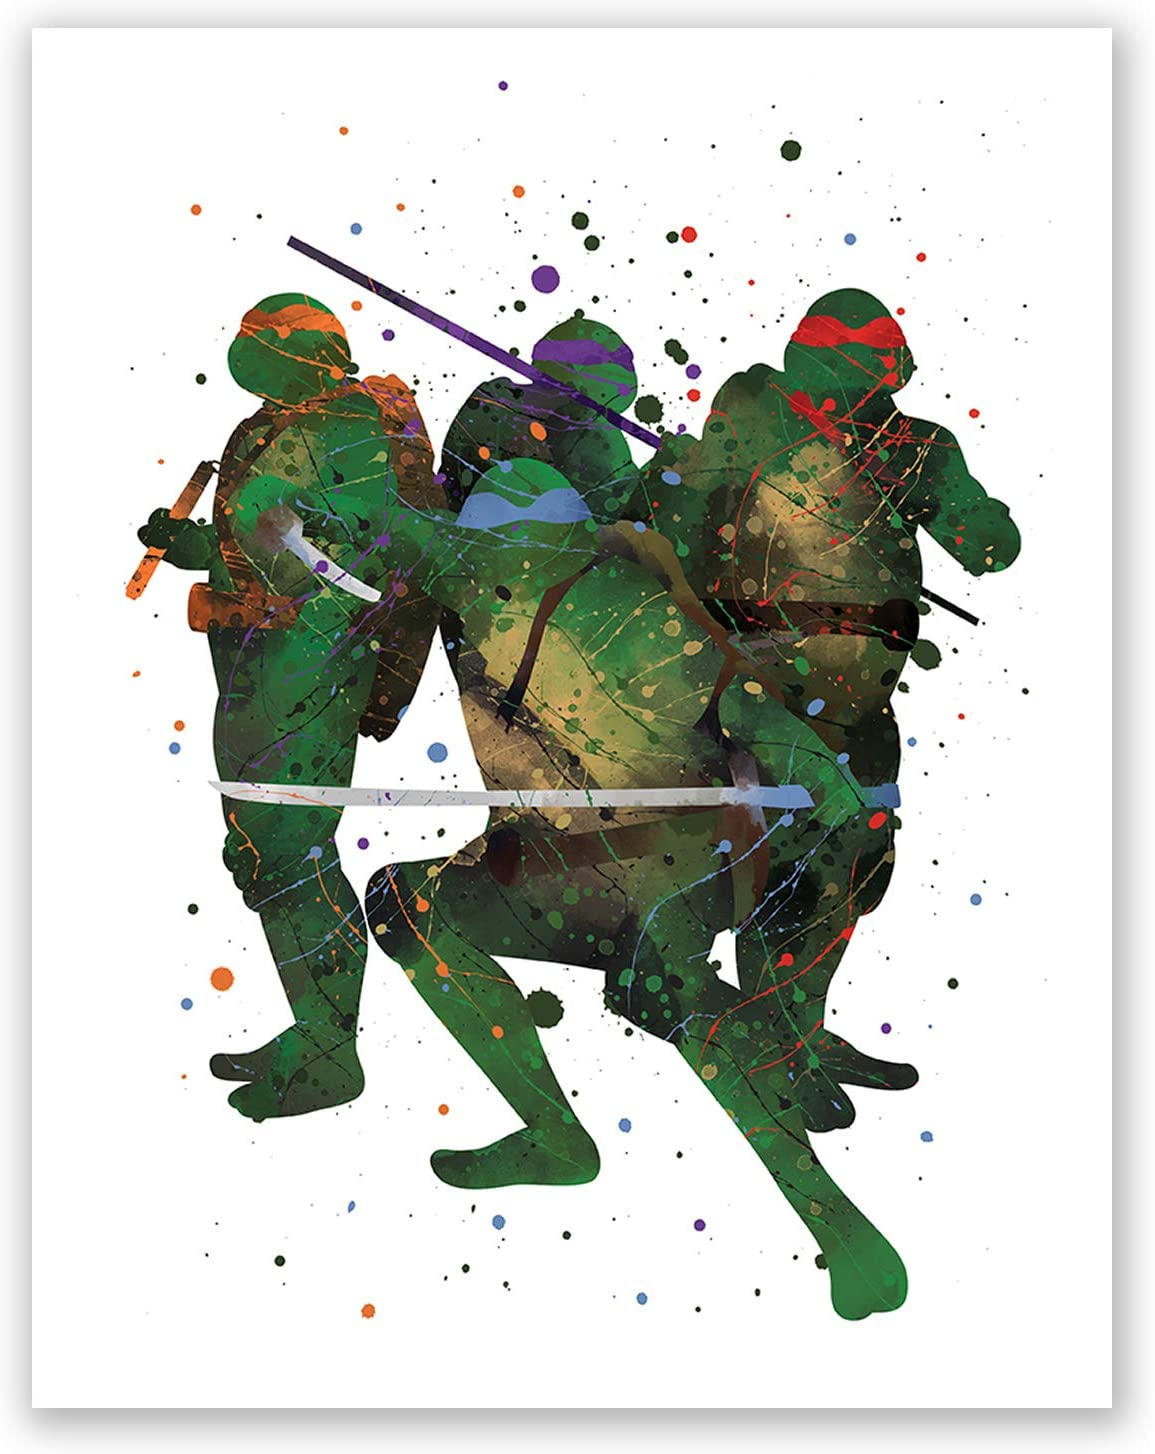 Donatello Teenage Mutant Ninja Turtle Type 1 Wall Art Watercolor Poster UNFRAMED